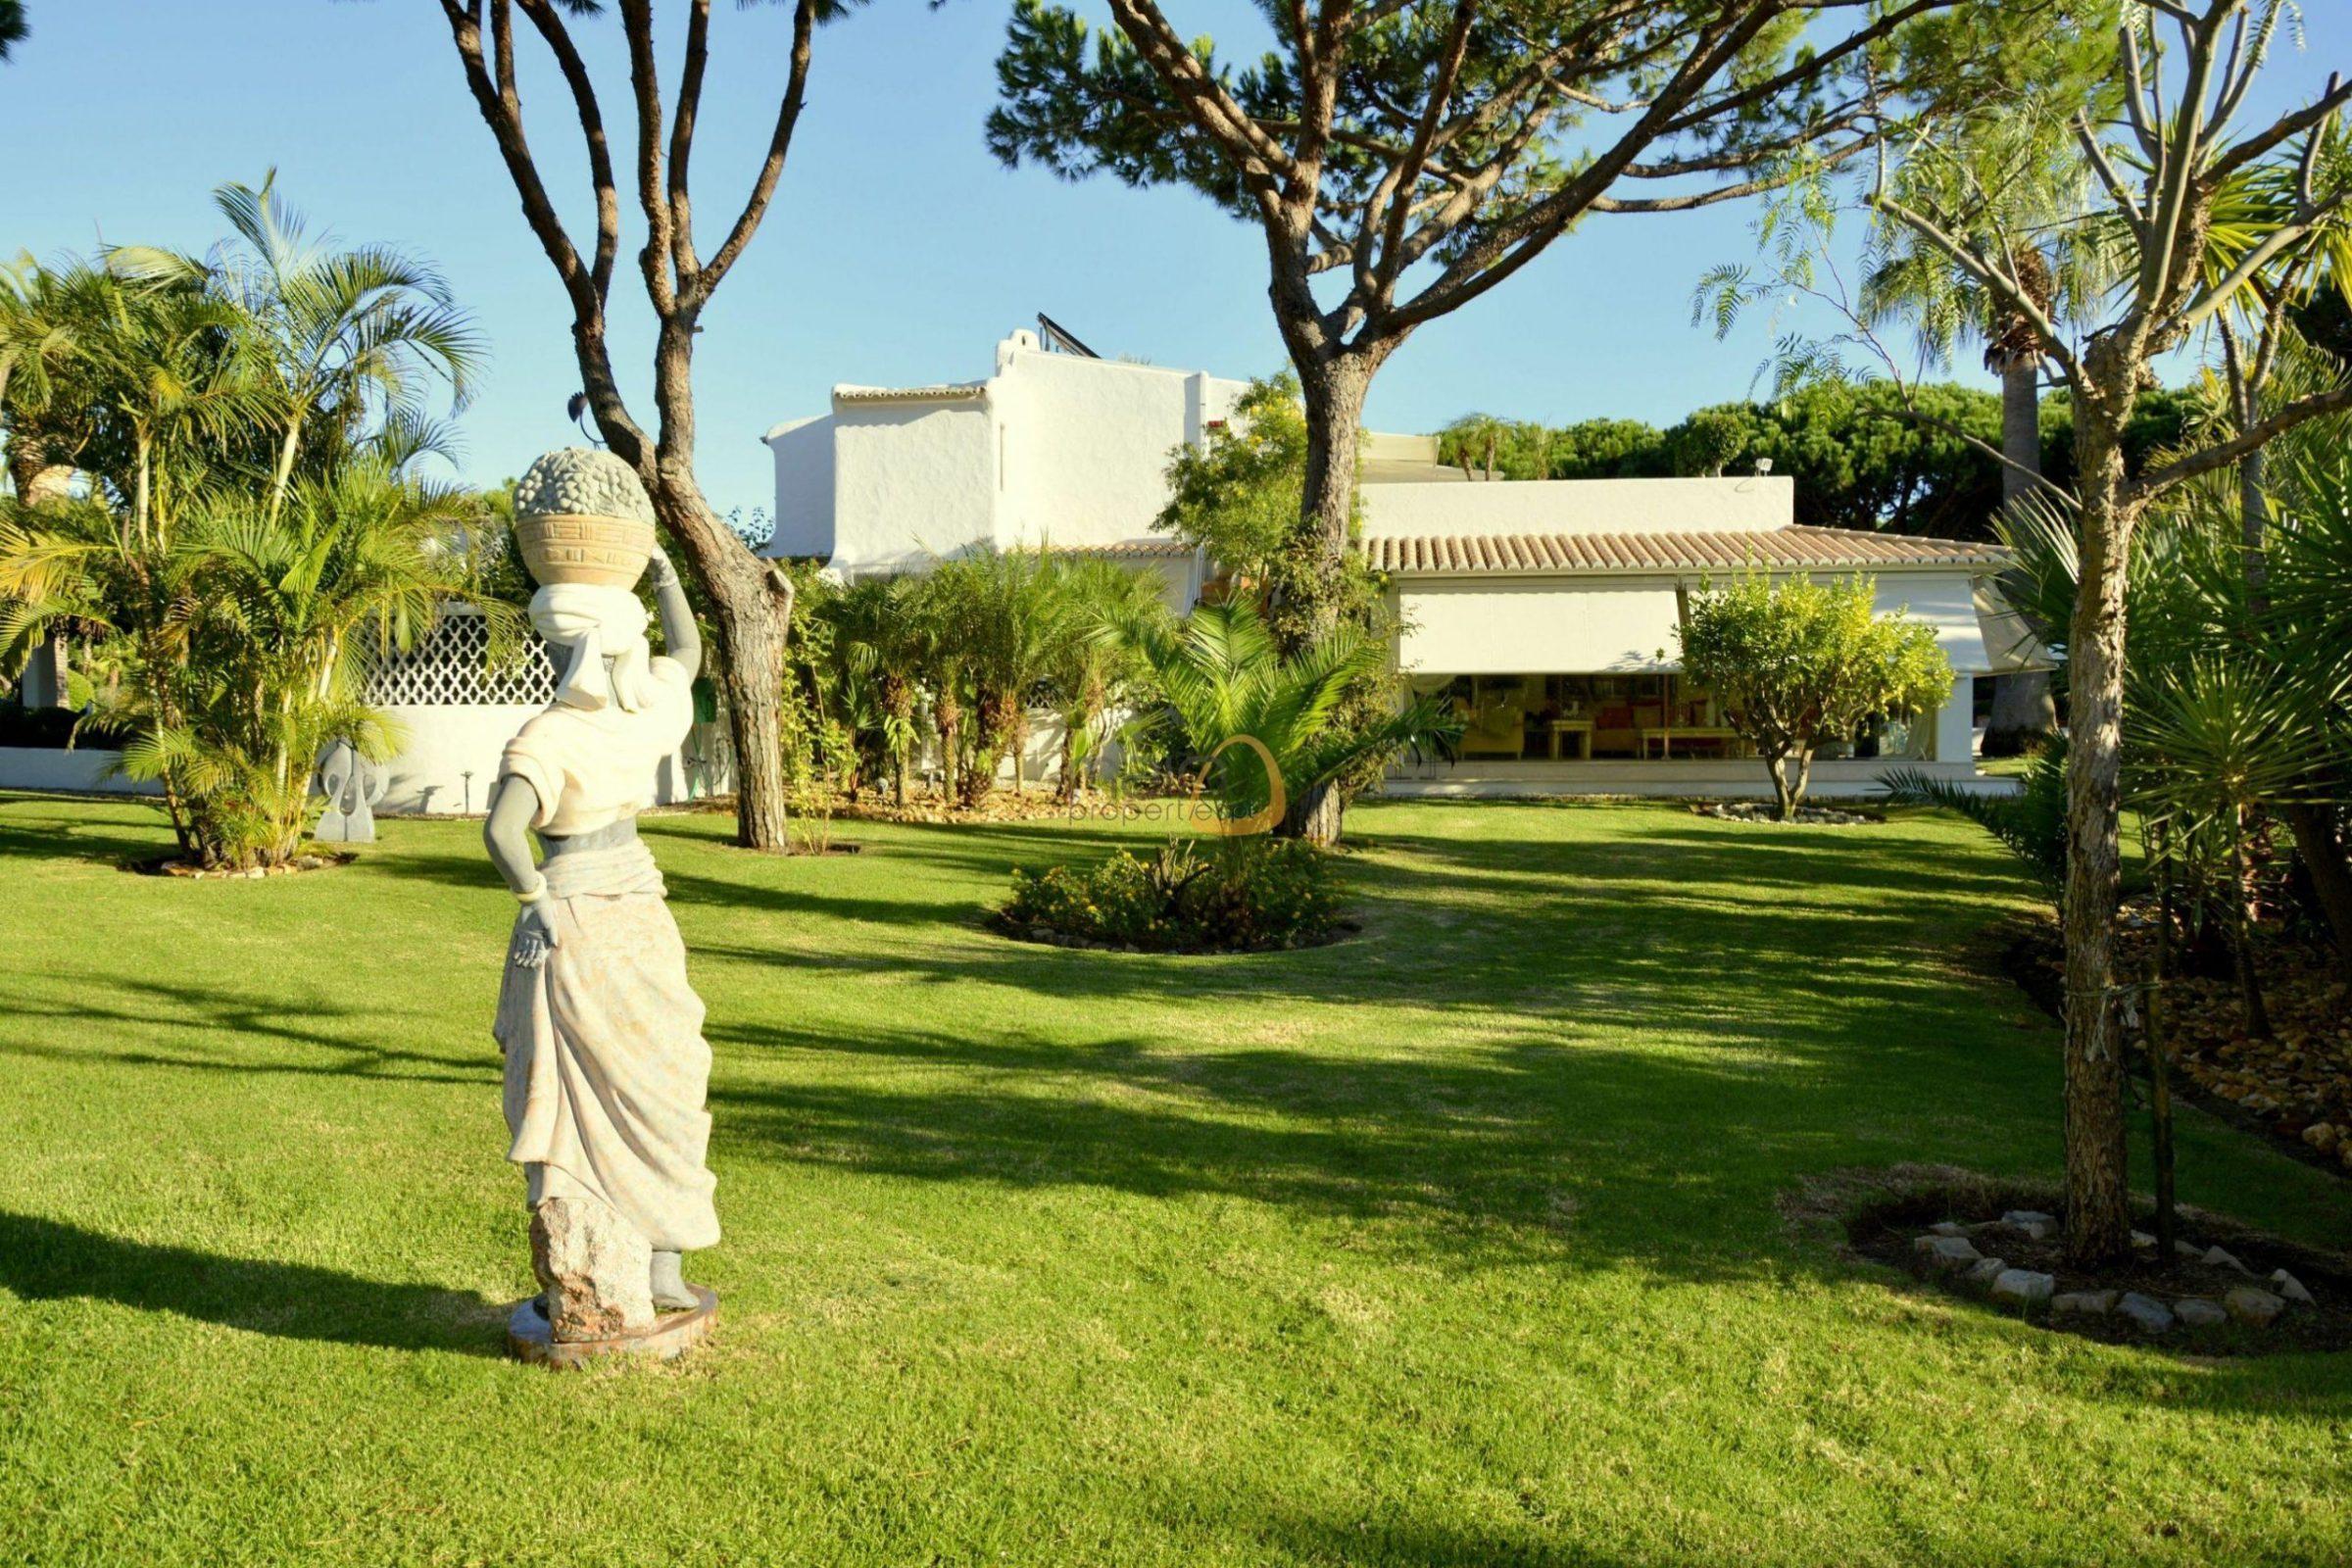 [:pt]Moradia com 5 quartos na Quinta do Lago :: Jardim :: MainProperties :: 020061[:en]5 bedroom villa in Quinta do Lago :: Garden :: MainProperties :: 020061[:]